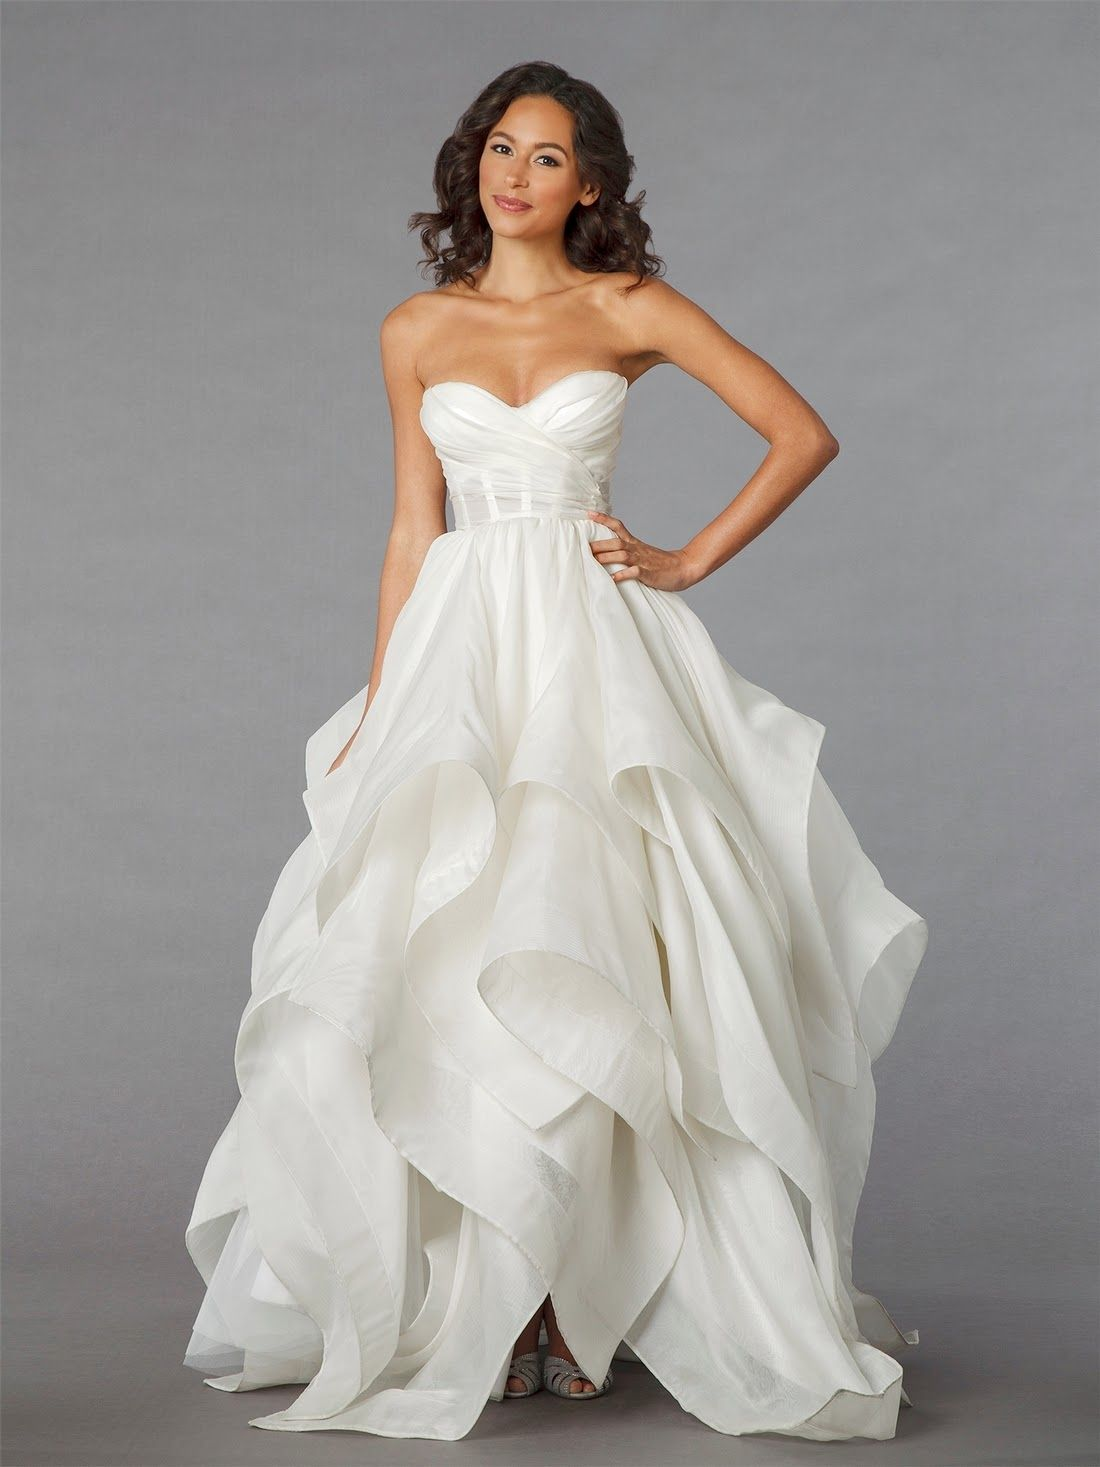 30 Dramatic And Sexy Wedding Dresses Future Wedding Ideas